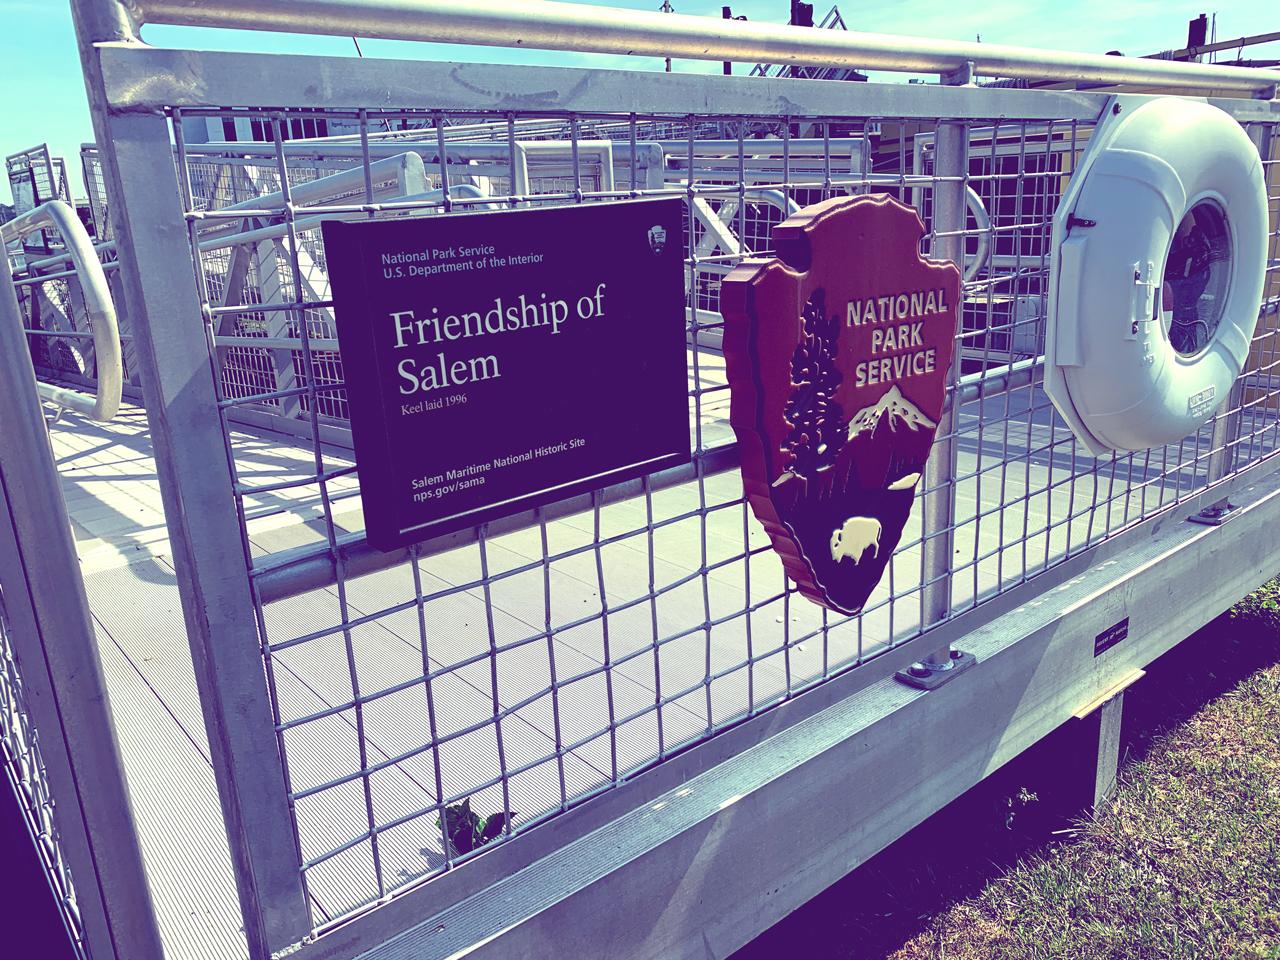 friendship-ship-salem-massachusetts-1280x960-05